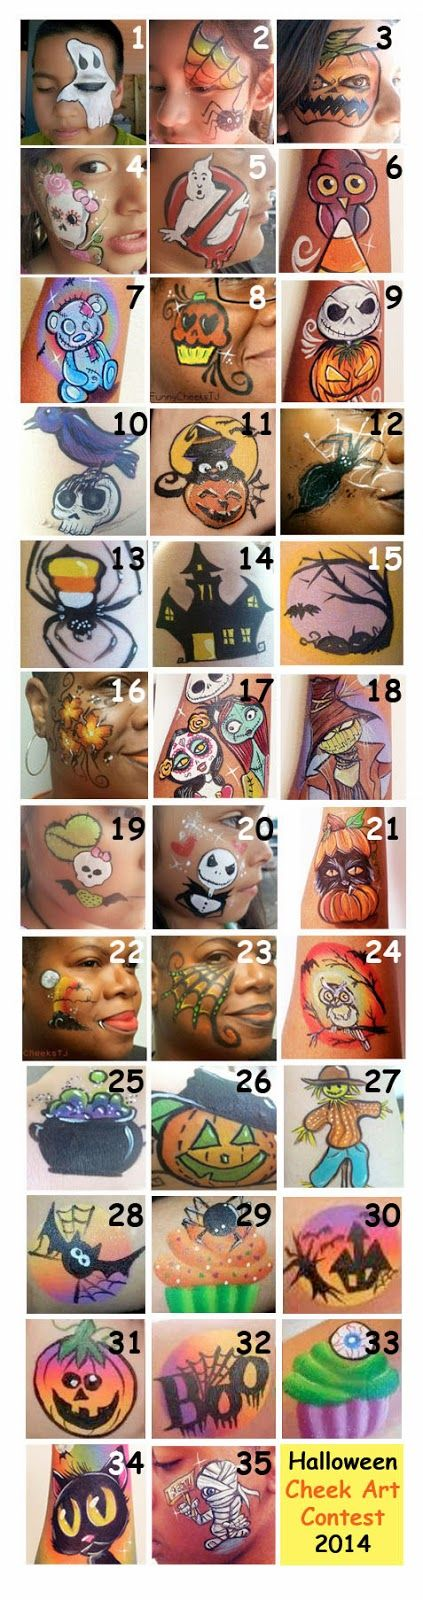 Paintertainment: Halloween Cheek Art Contest - VOTE for the Winner!